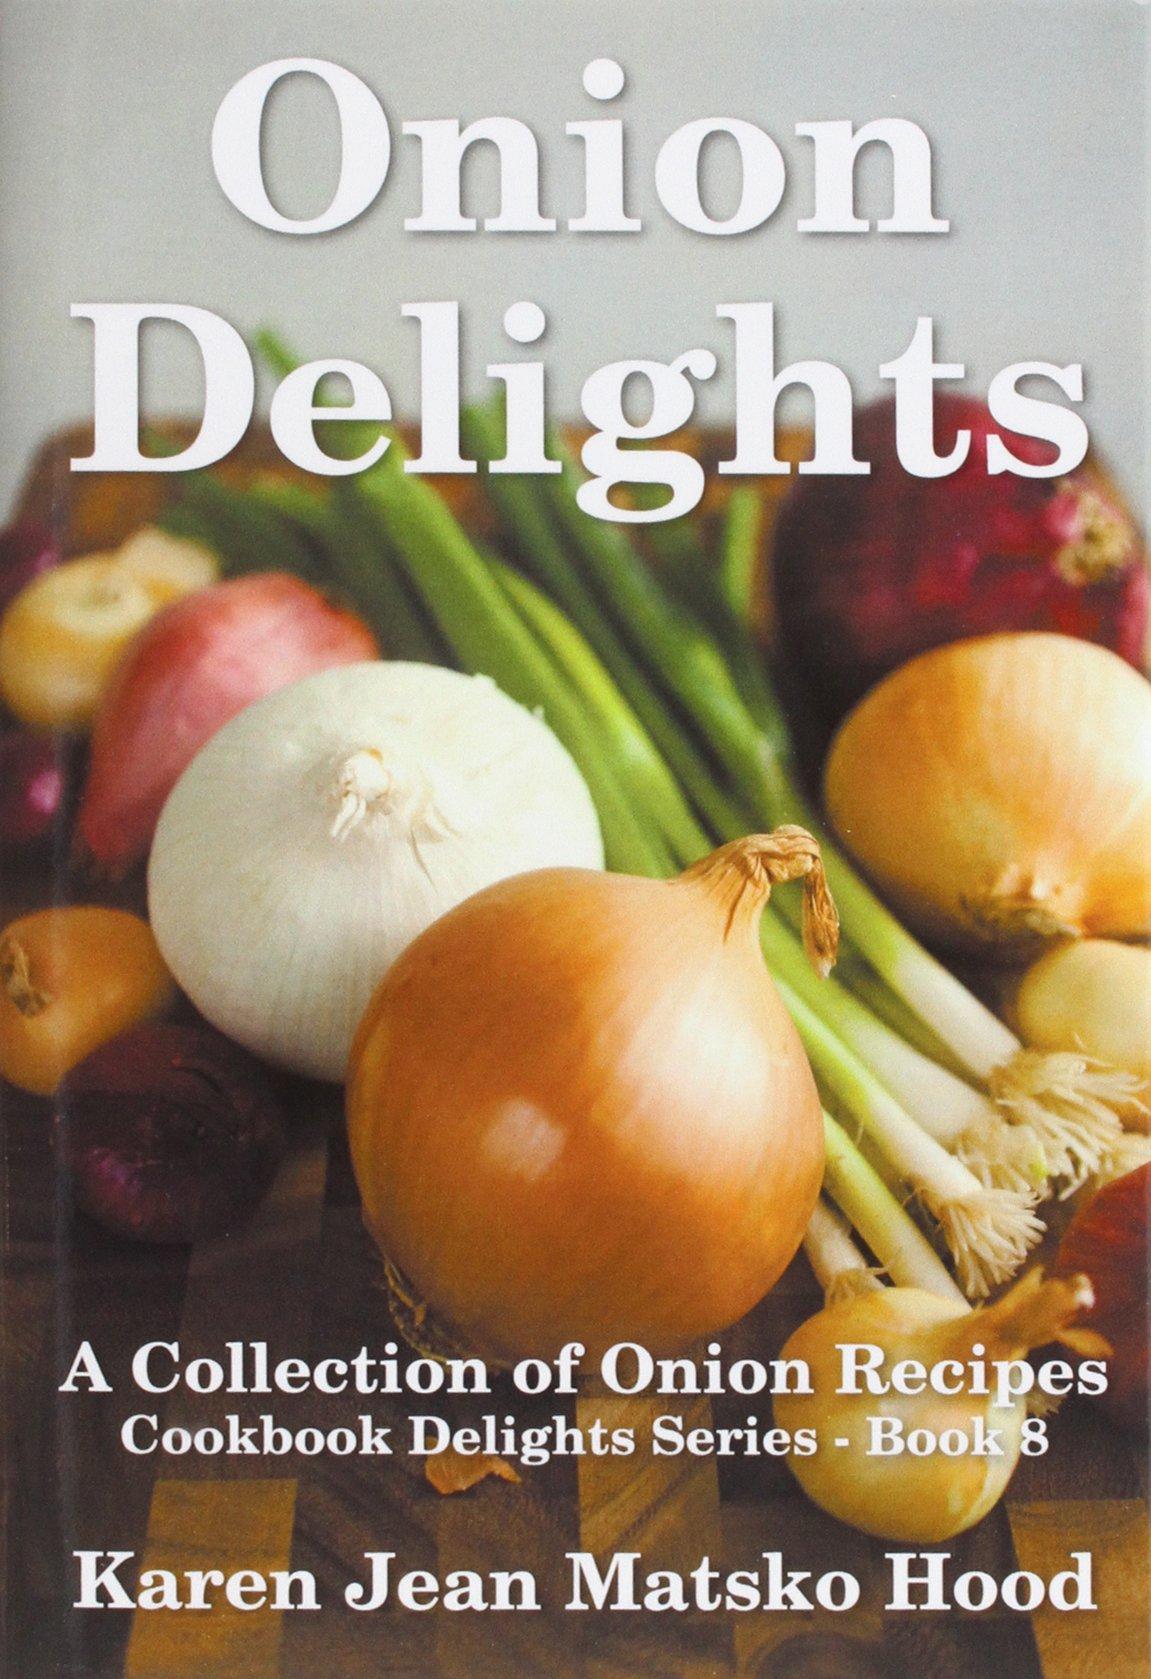 Onion Delights Cookbook: A Collection of Onion Recipes (Cookbook Delights) pdf epub